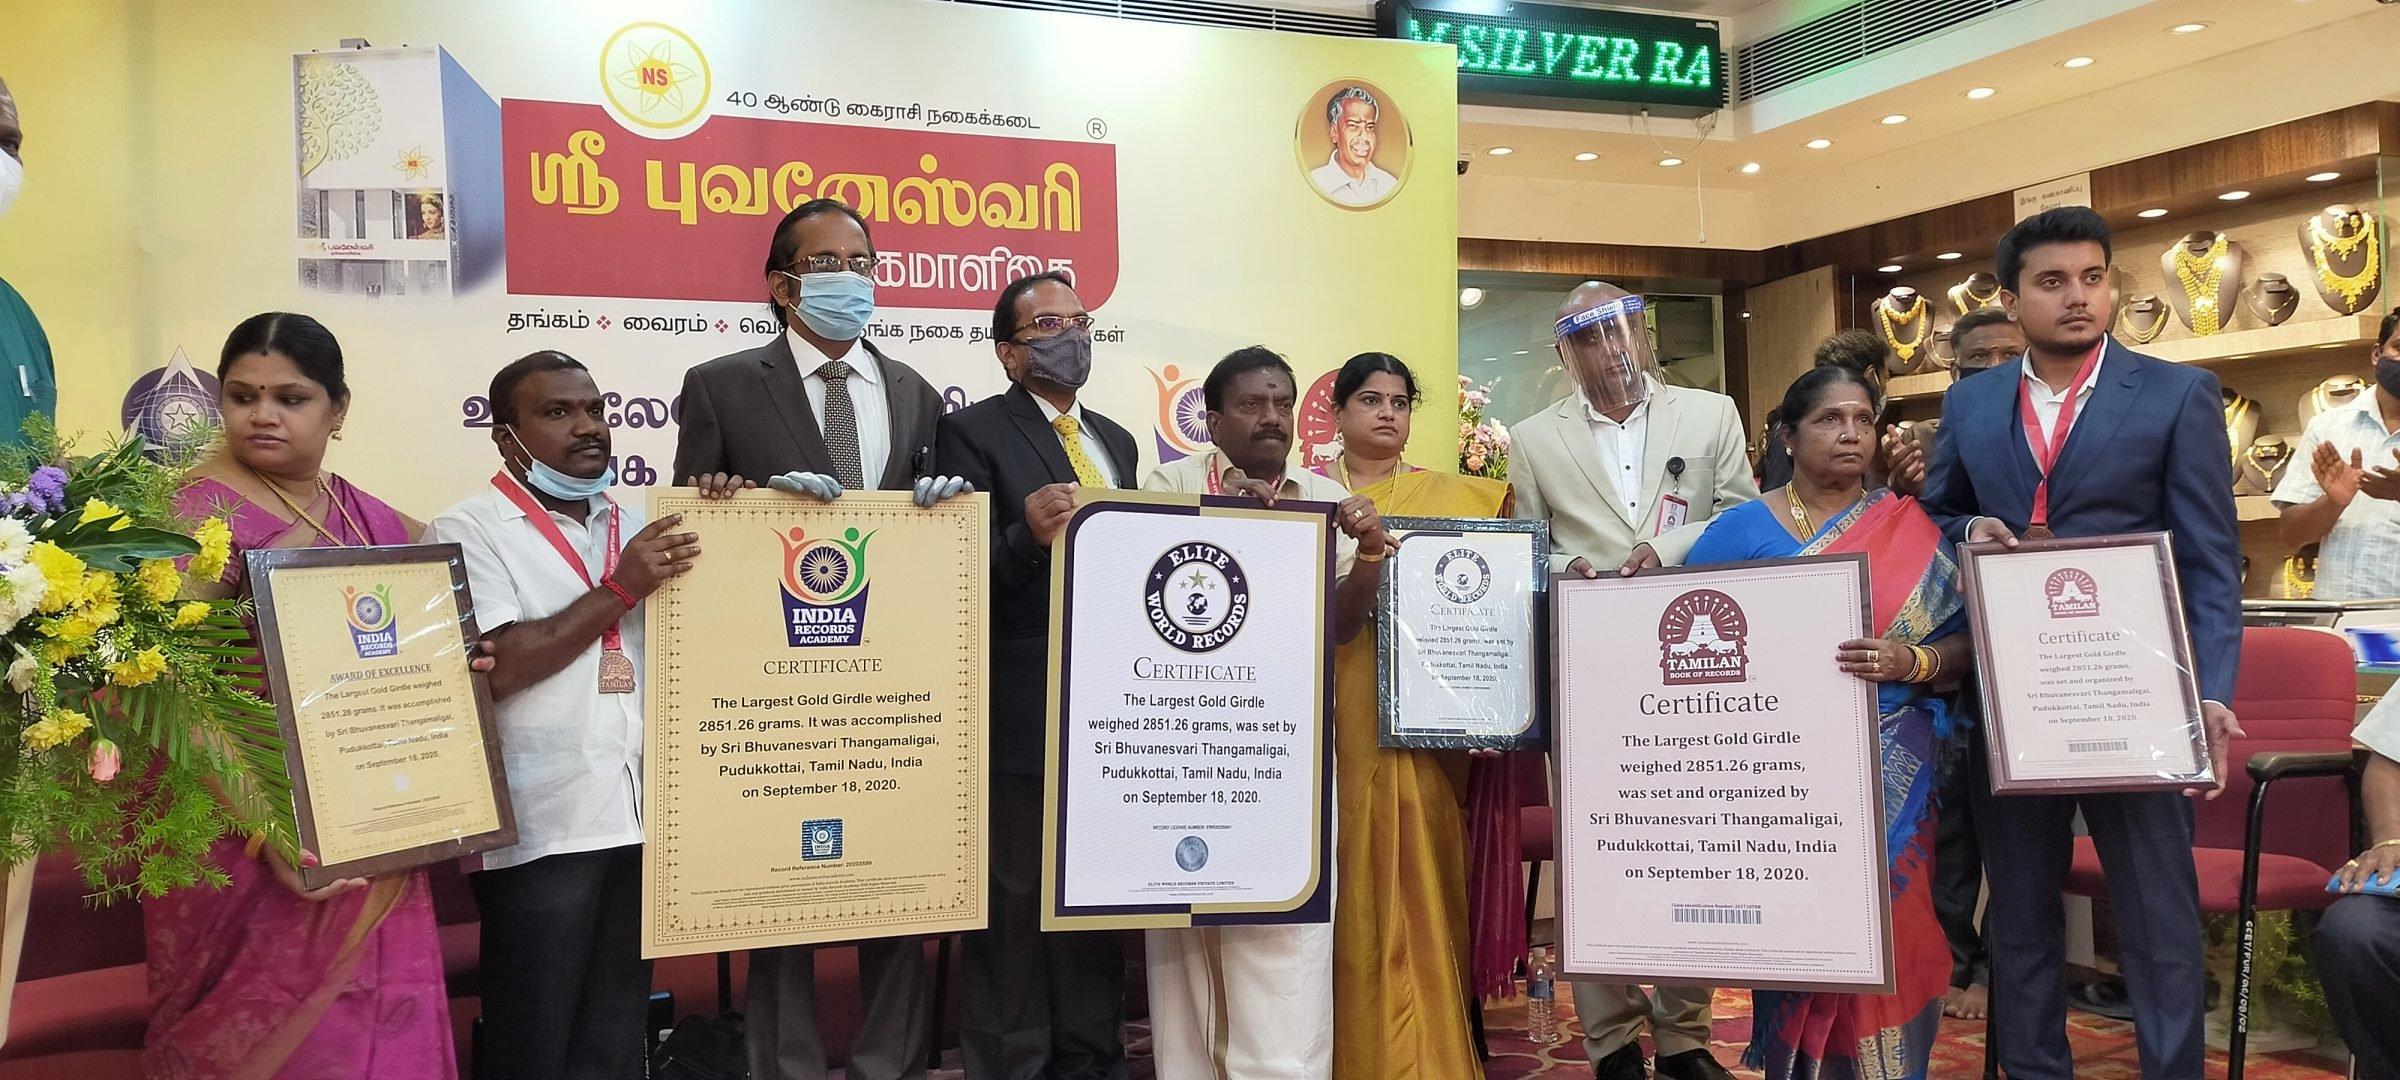 Sri Bhuvanesvari Thangamaligai in Tamil Nadu Creates a New World Record by making the World's Largest Gold Girdle - Digpu News